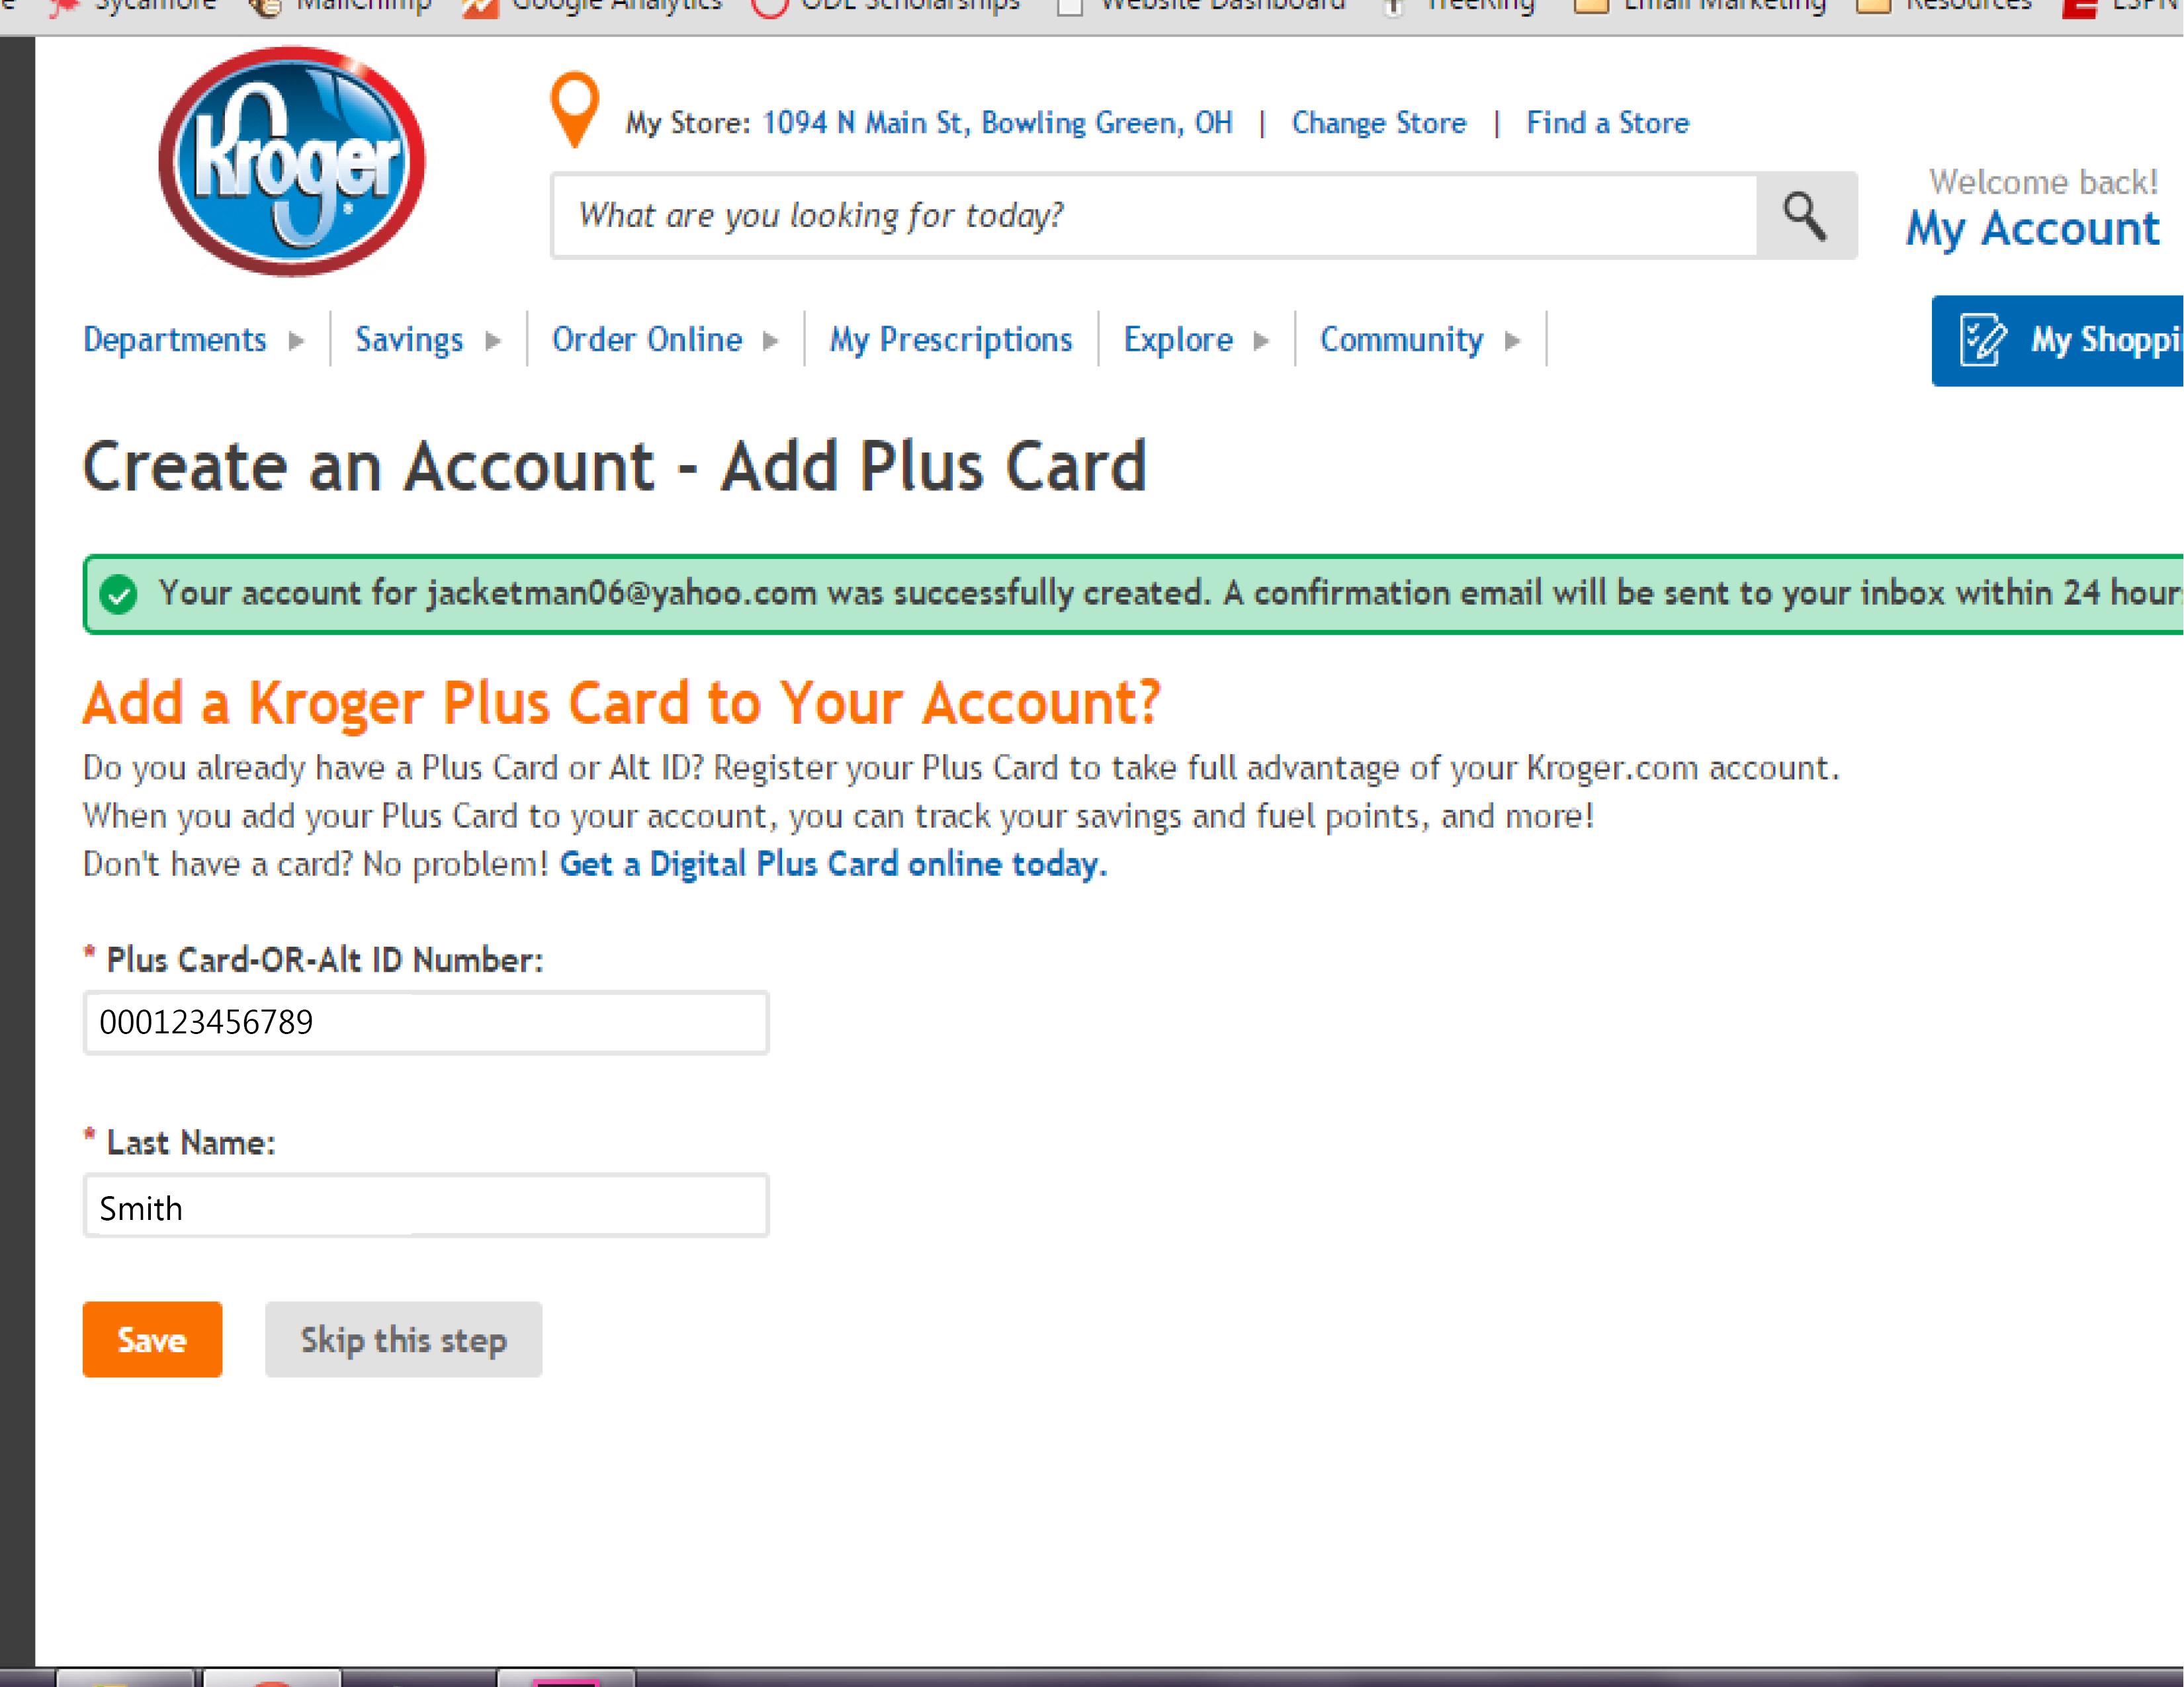 Kroger Rewards Sign Up_Creat Account Step 2